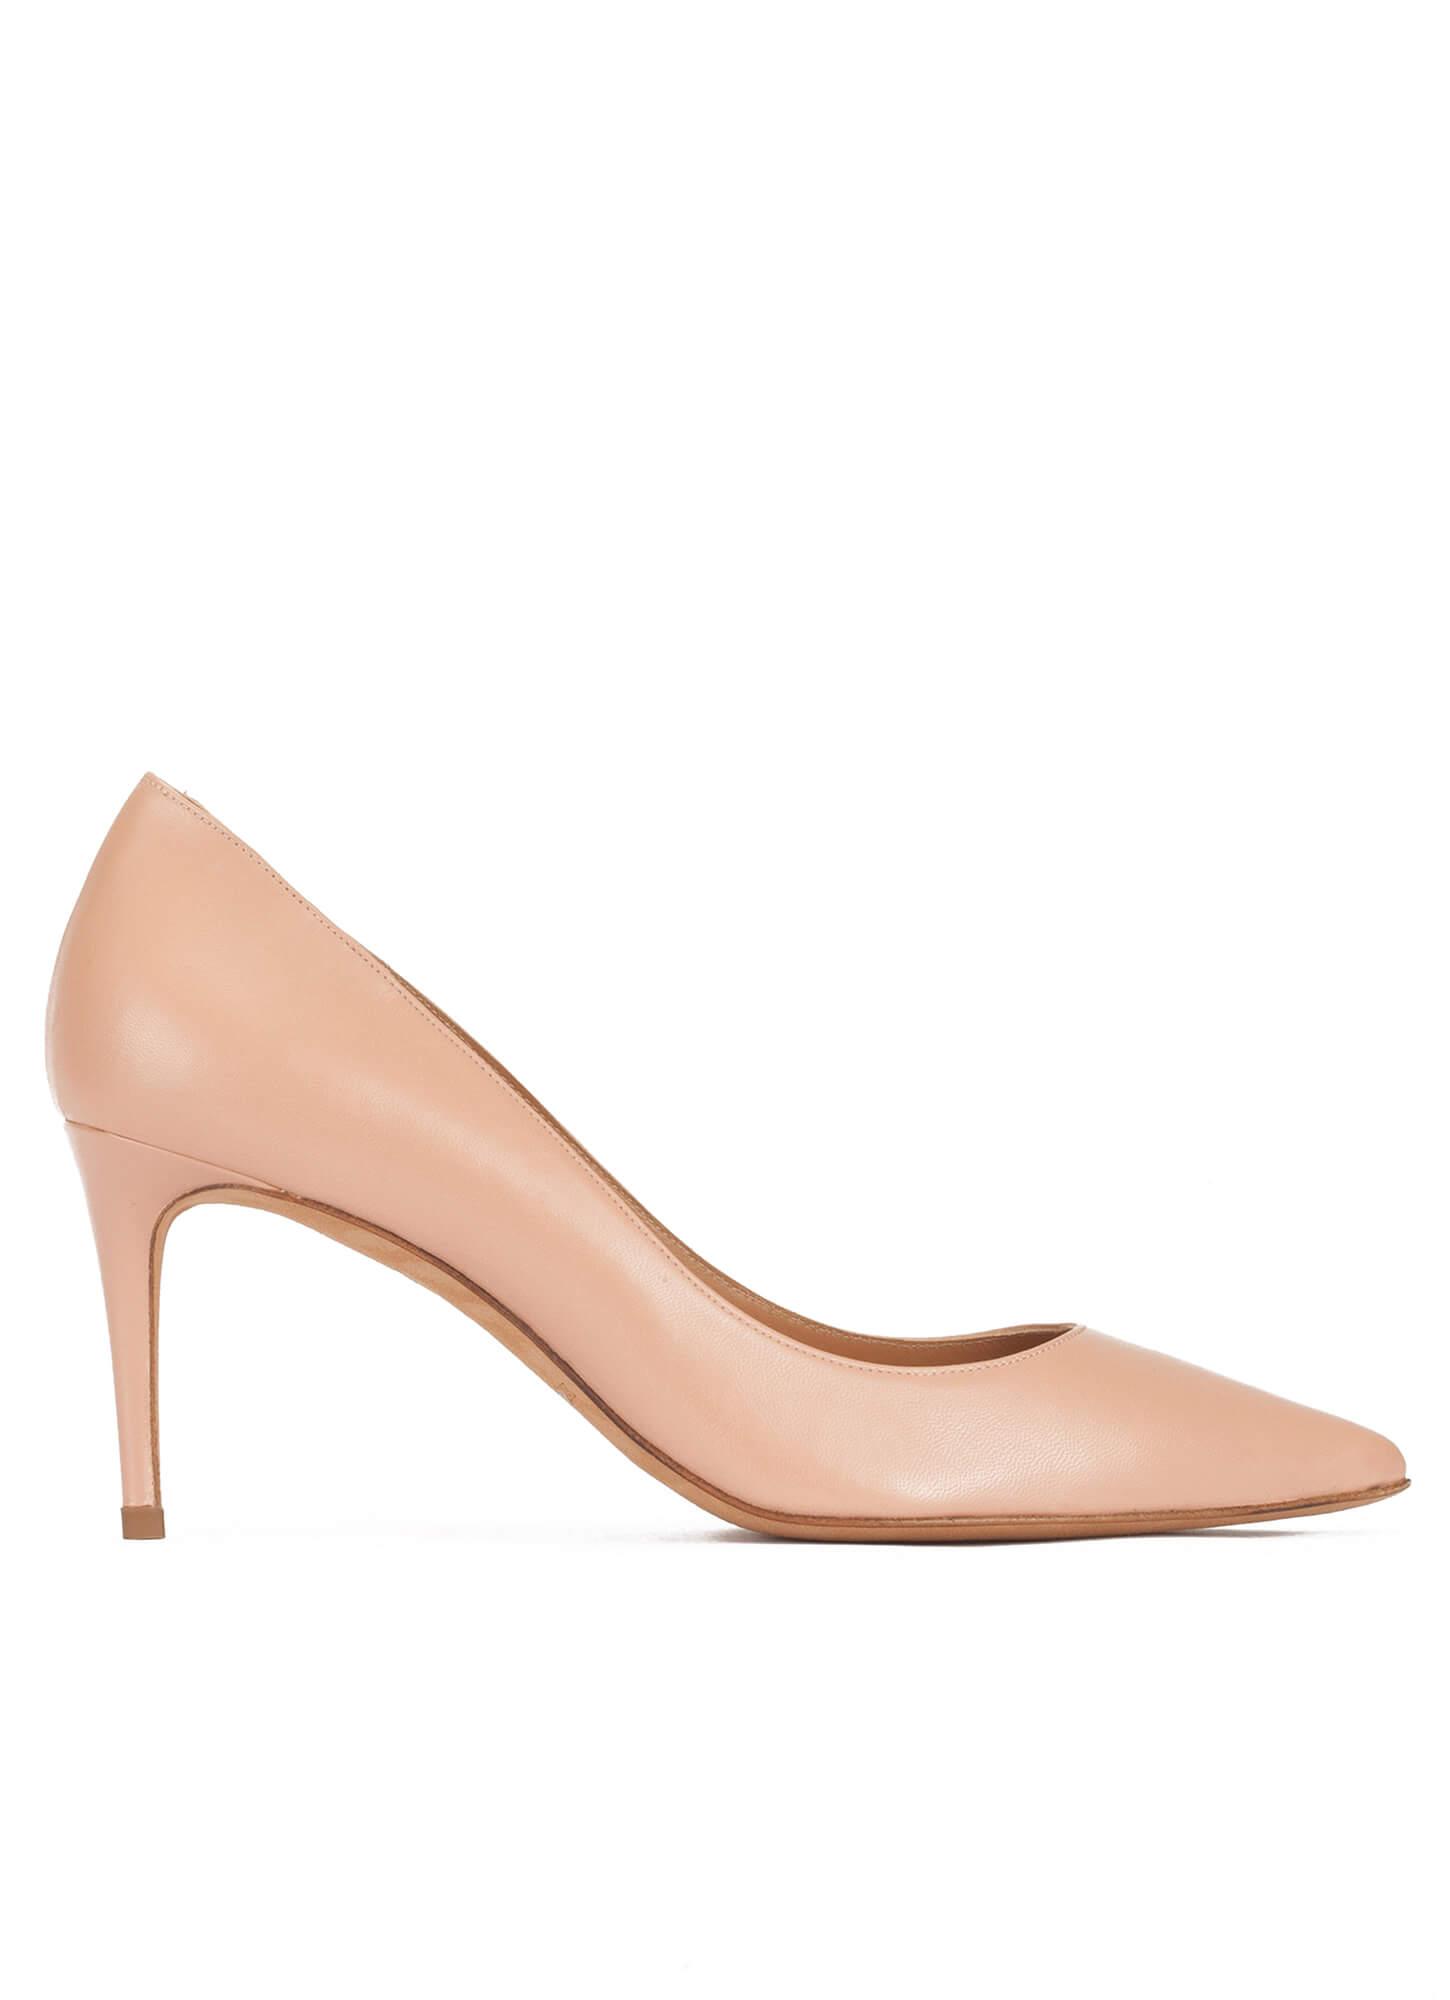 b2a473c92dbf Oana Pura López. Mid heel sharp point-toe pumps in nude leather ...